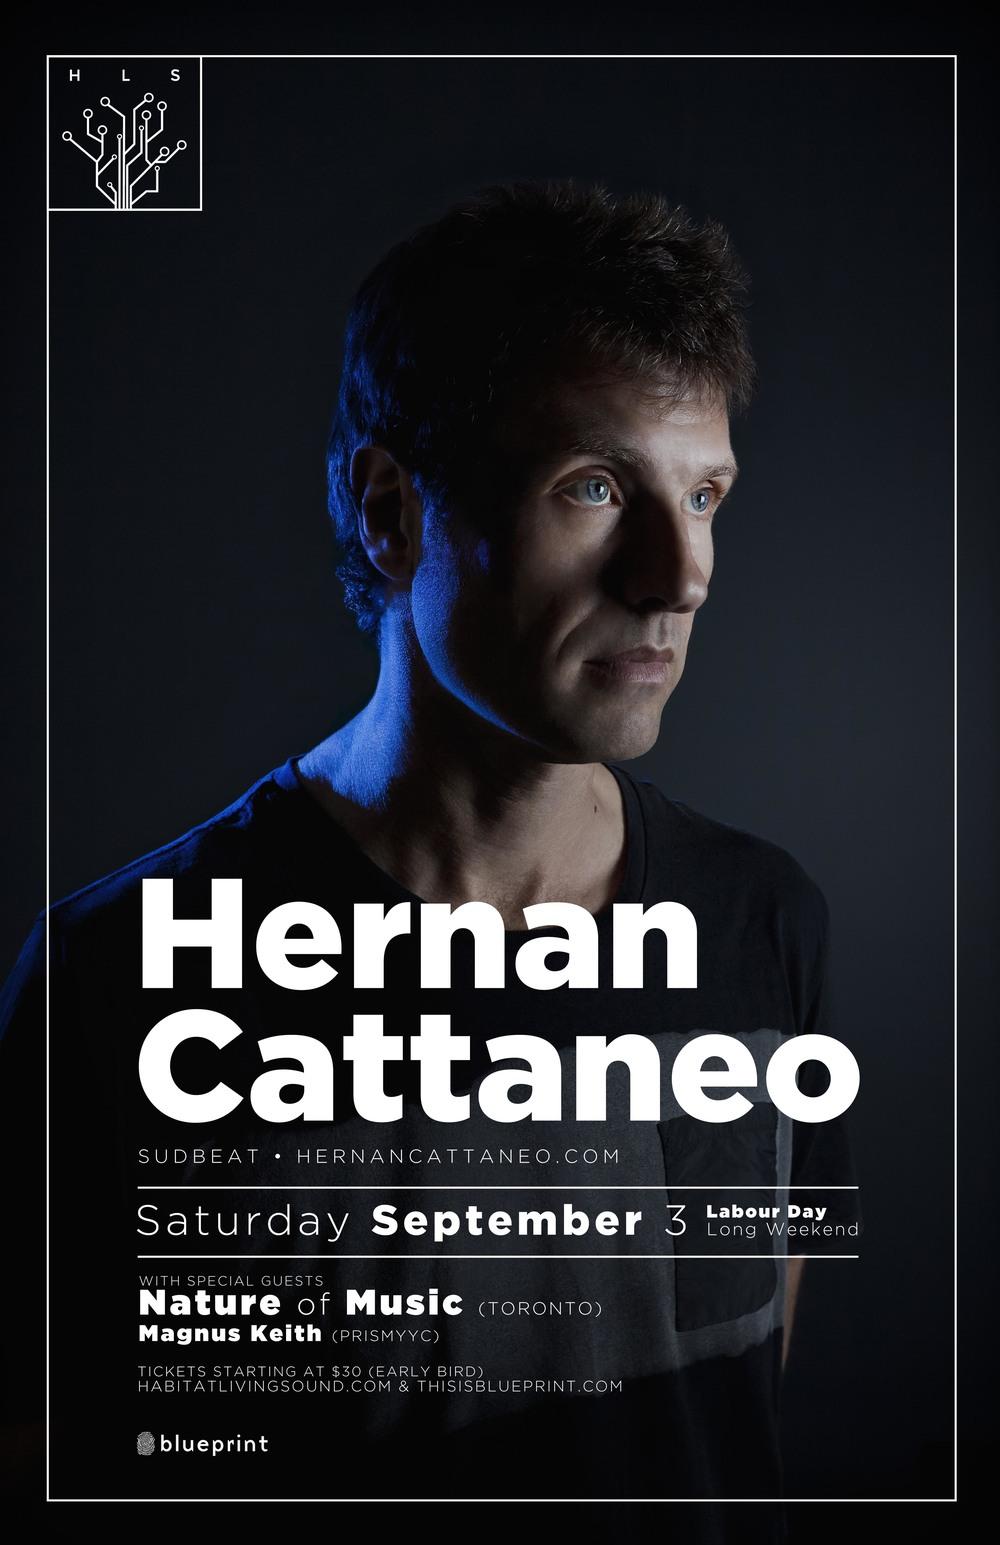 hernan-cattaneo-habitat-living-sound.jpeg